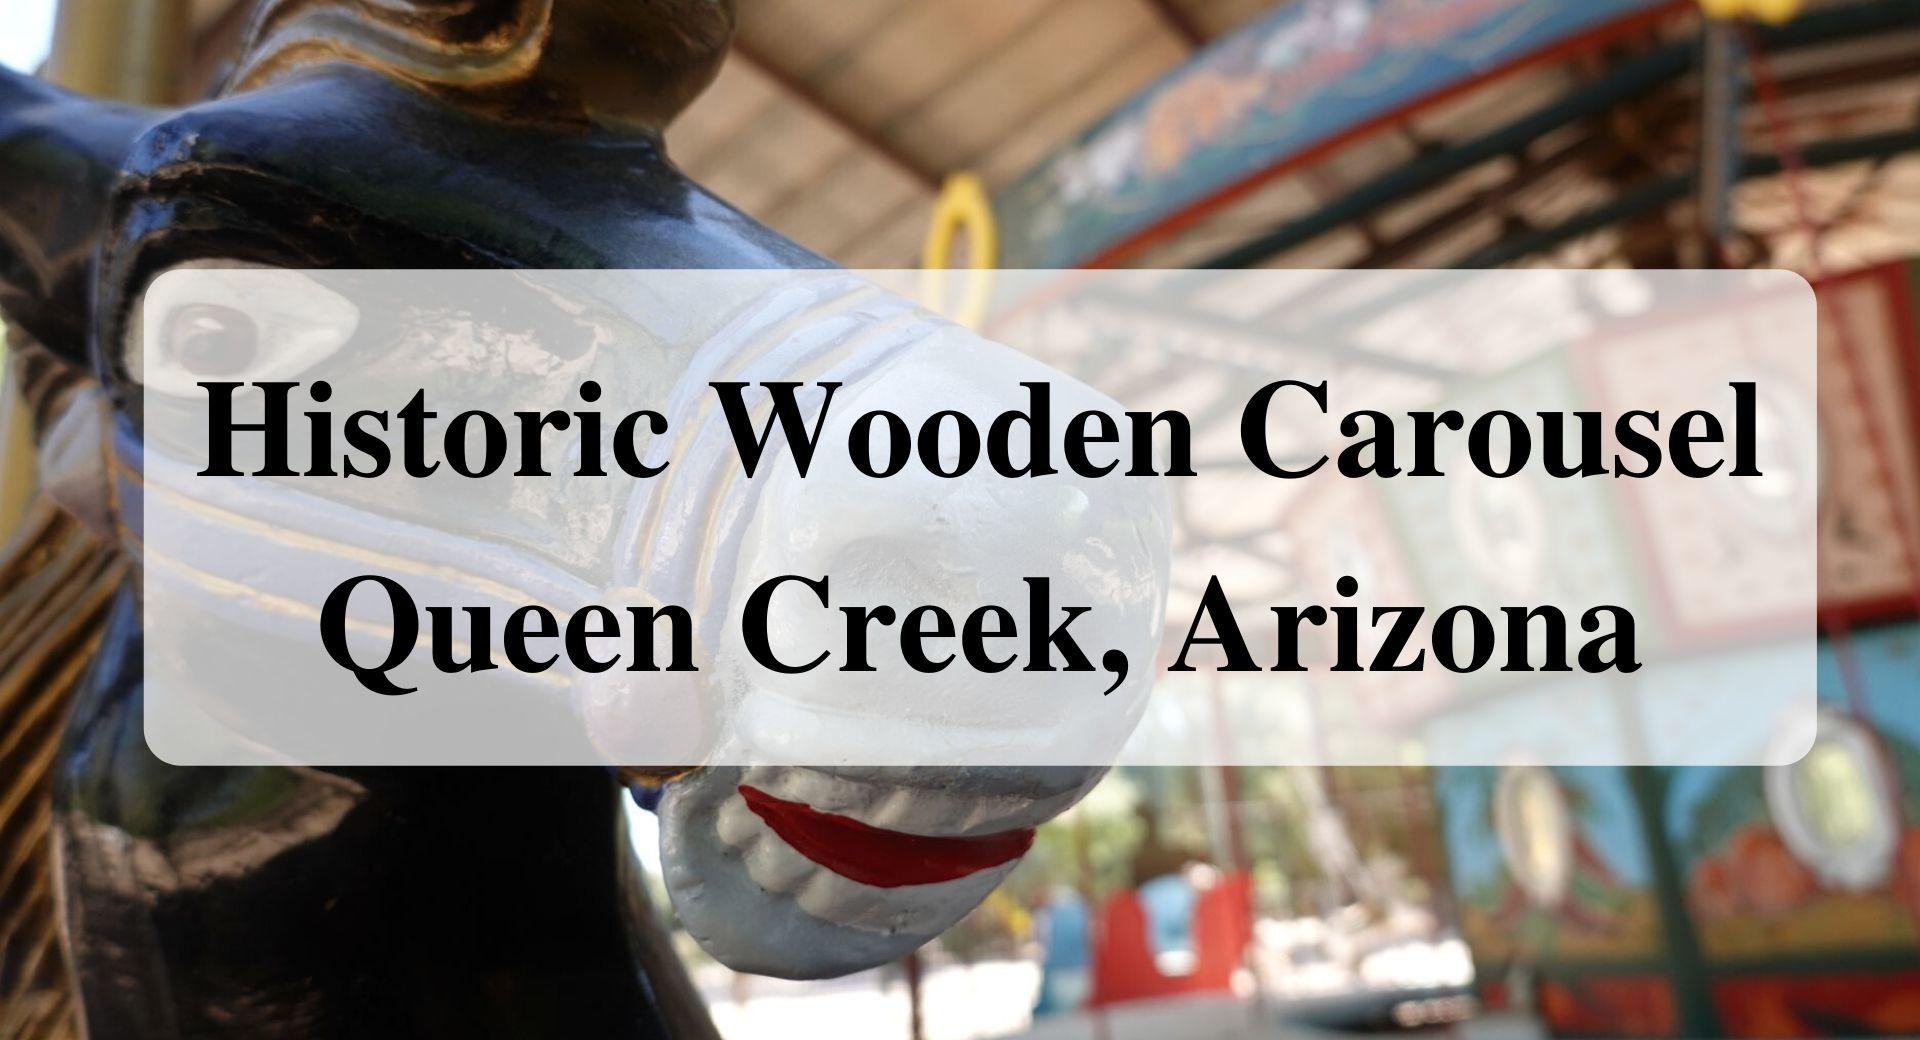 Historic Wooden Carousel Queen Creek, Arizona Forever Sabbatical